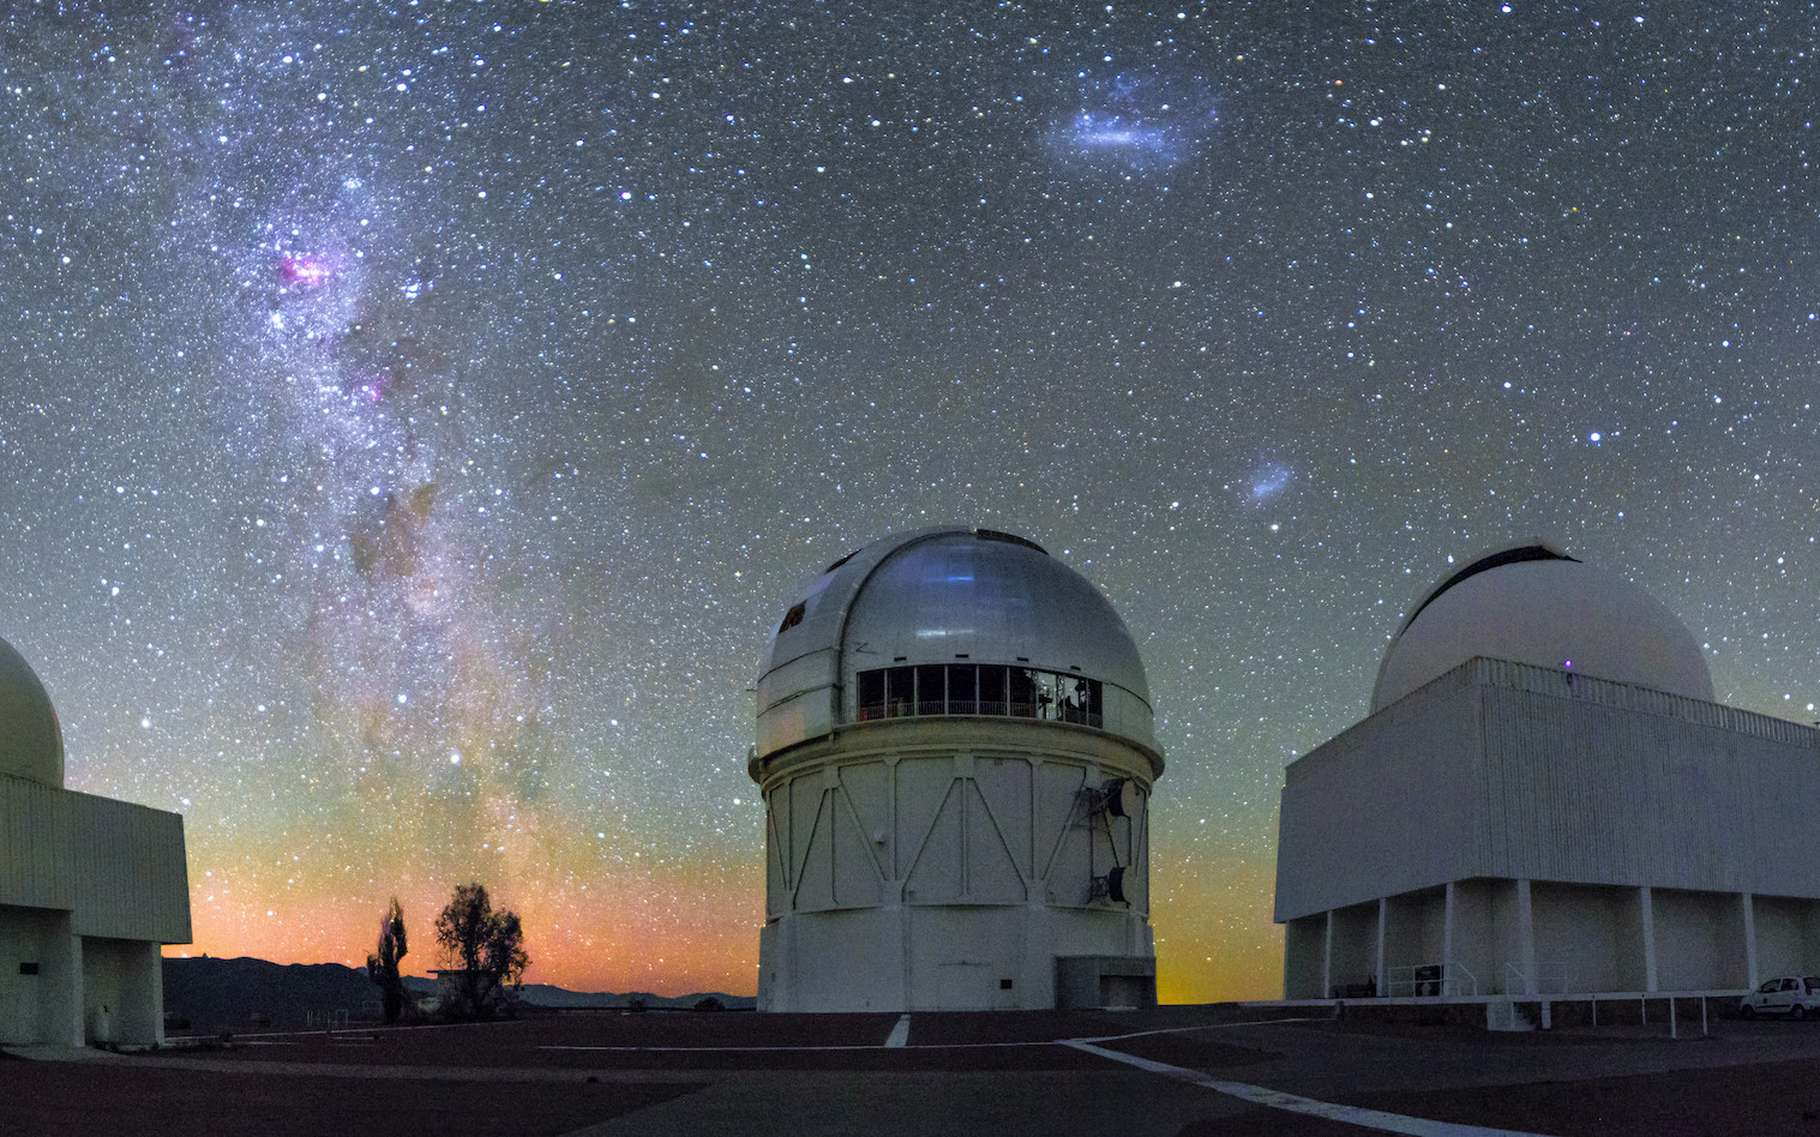 Les Nuages de Magellan au-dessus de l'observatoire interaméricain du Cerro Tololo (Chili). © CTIO, NOIRLab, NSF, AURA, H. Stockebrand